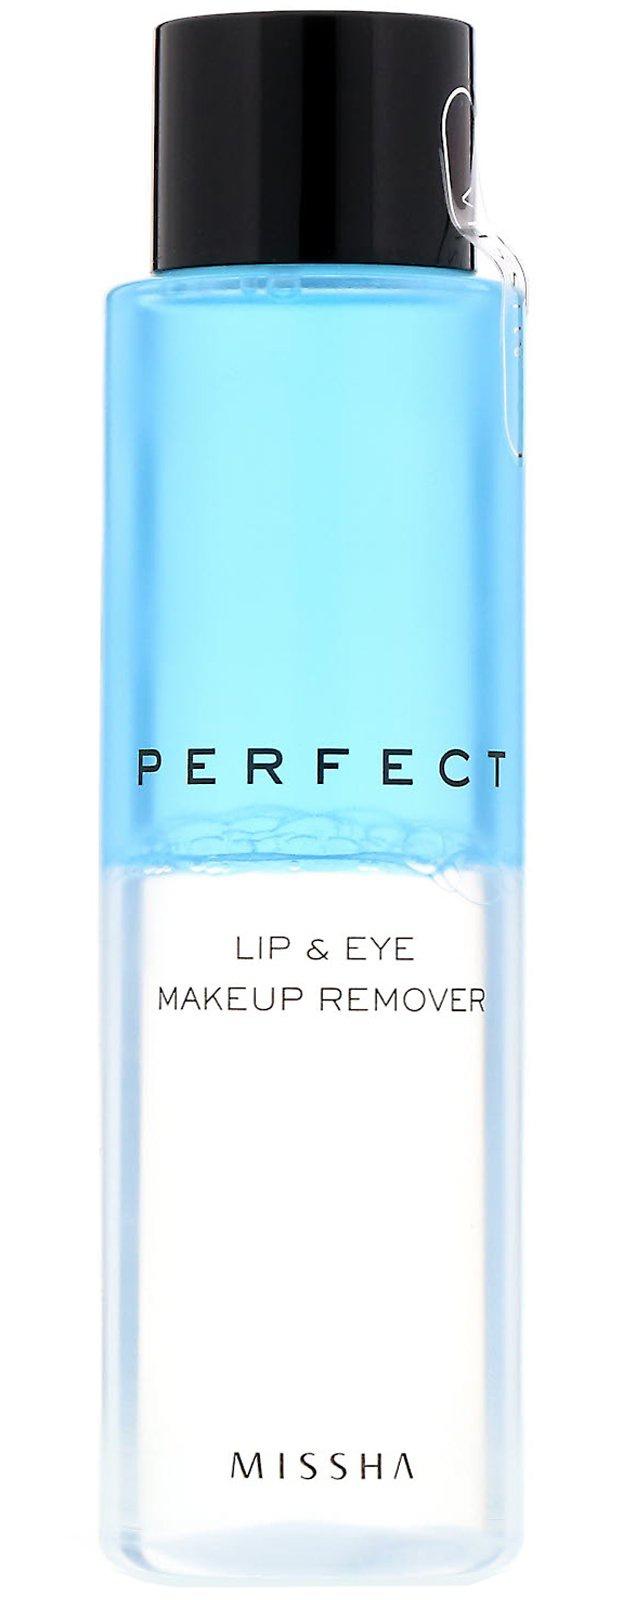 Missha Perfect Lip & Eye Makeup Remover